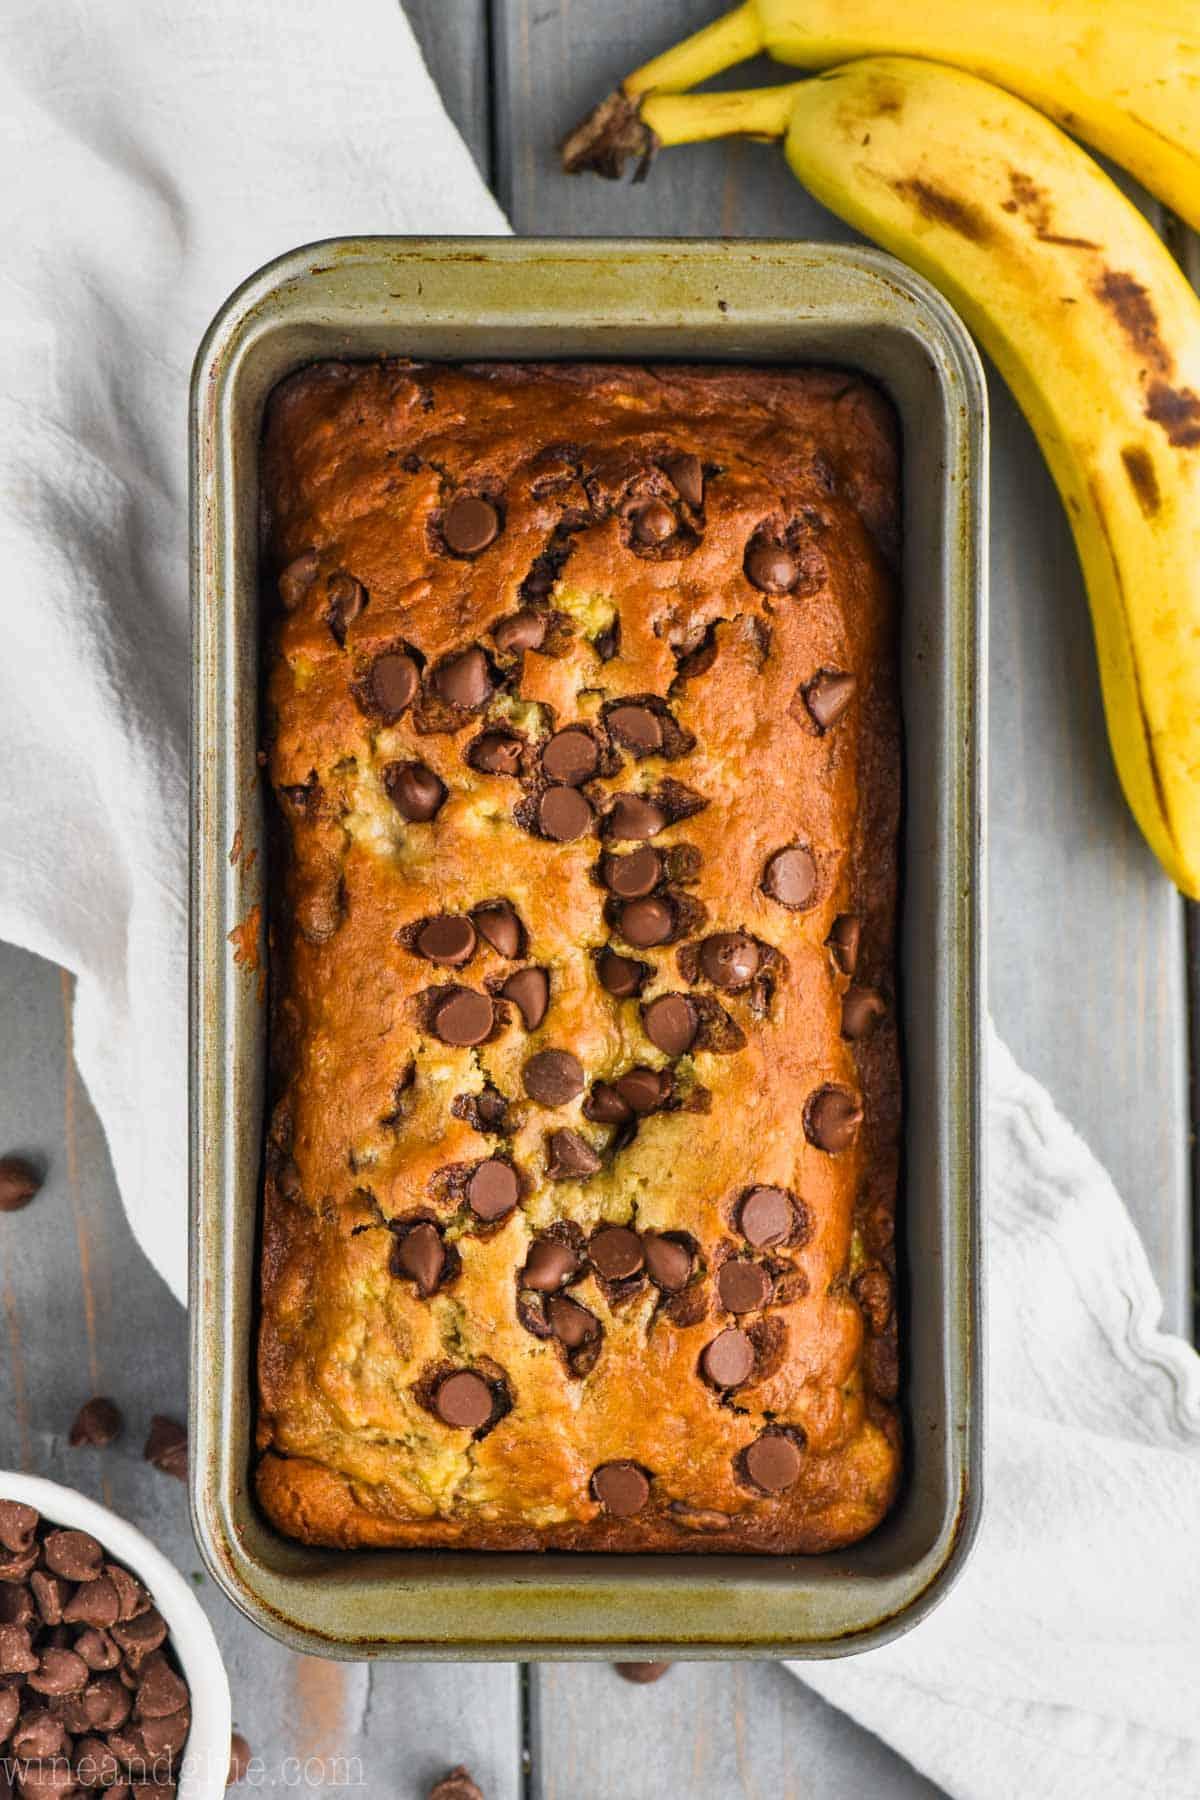 The Best Chocolate Chip Banana Bread Recipe